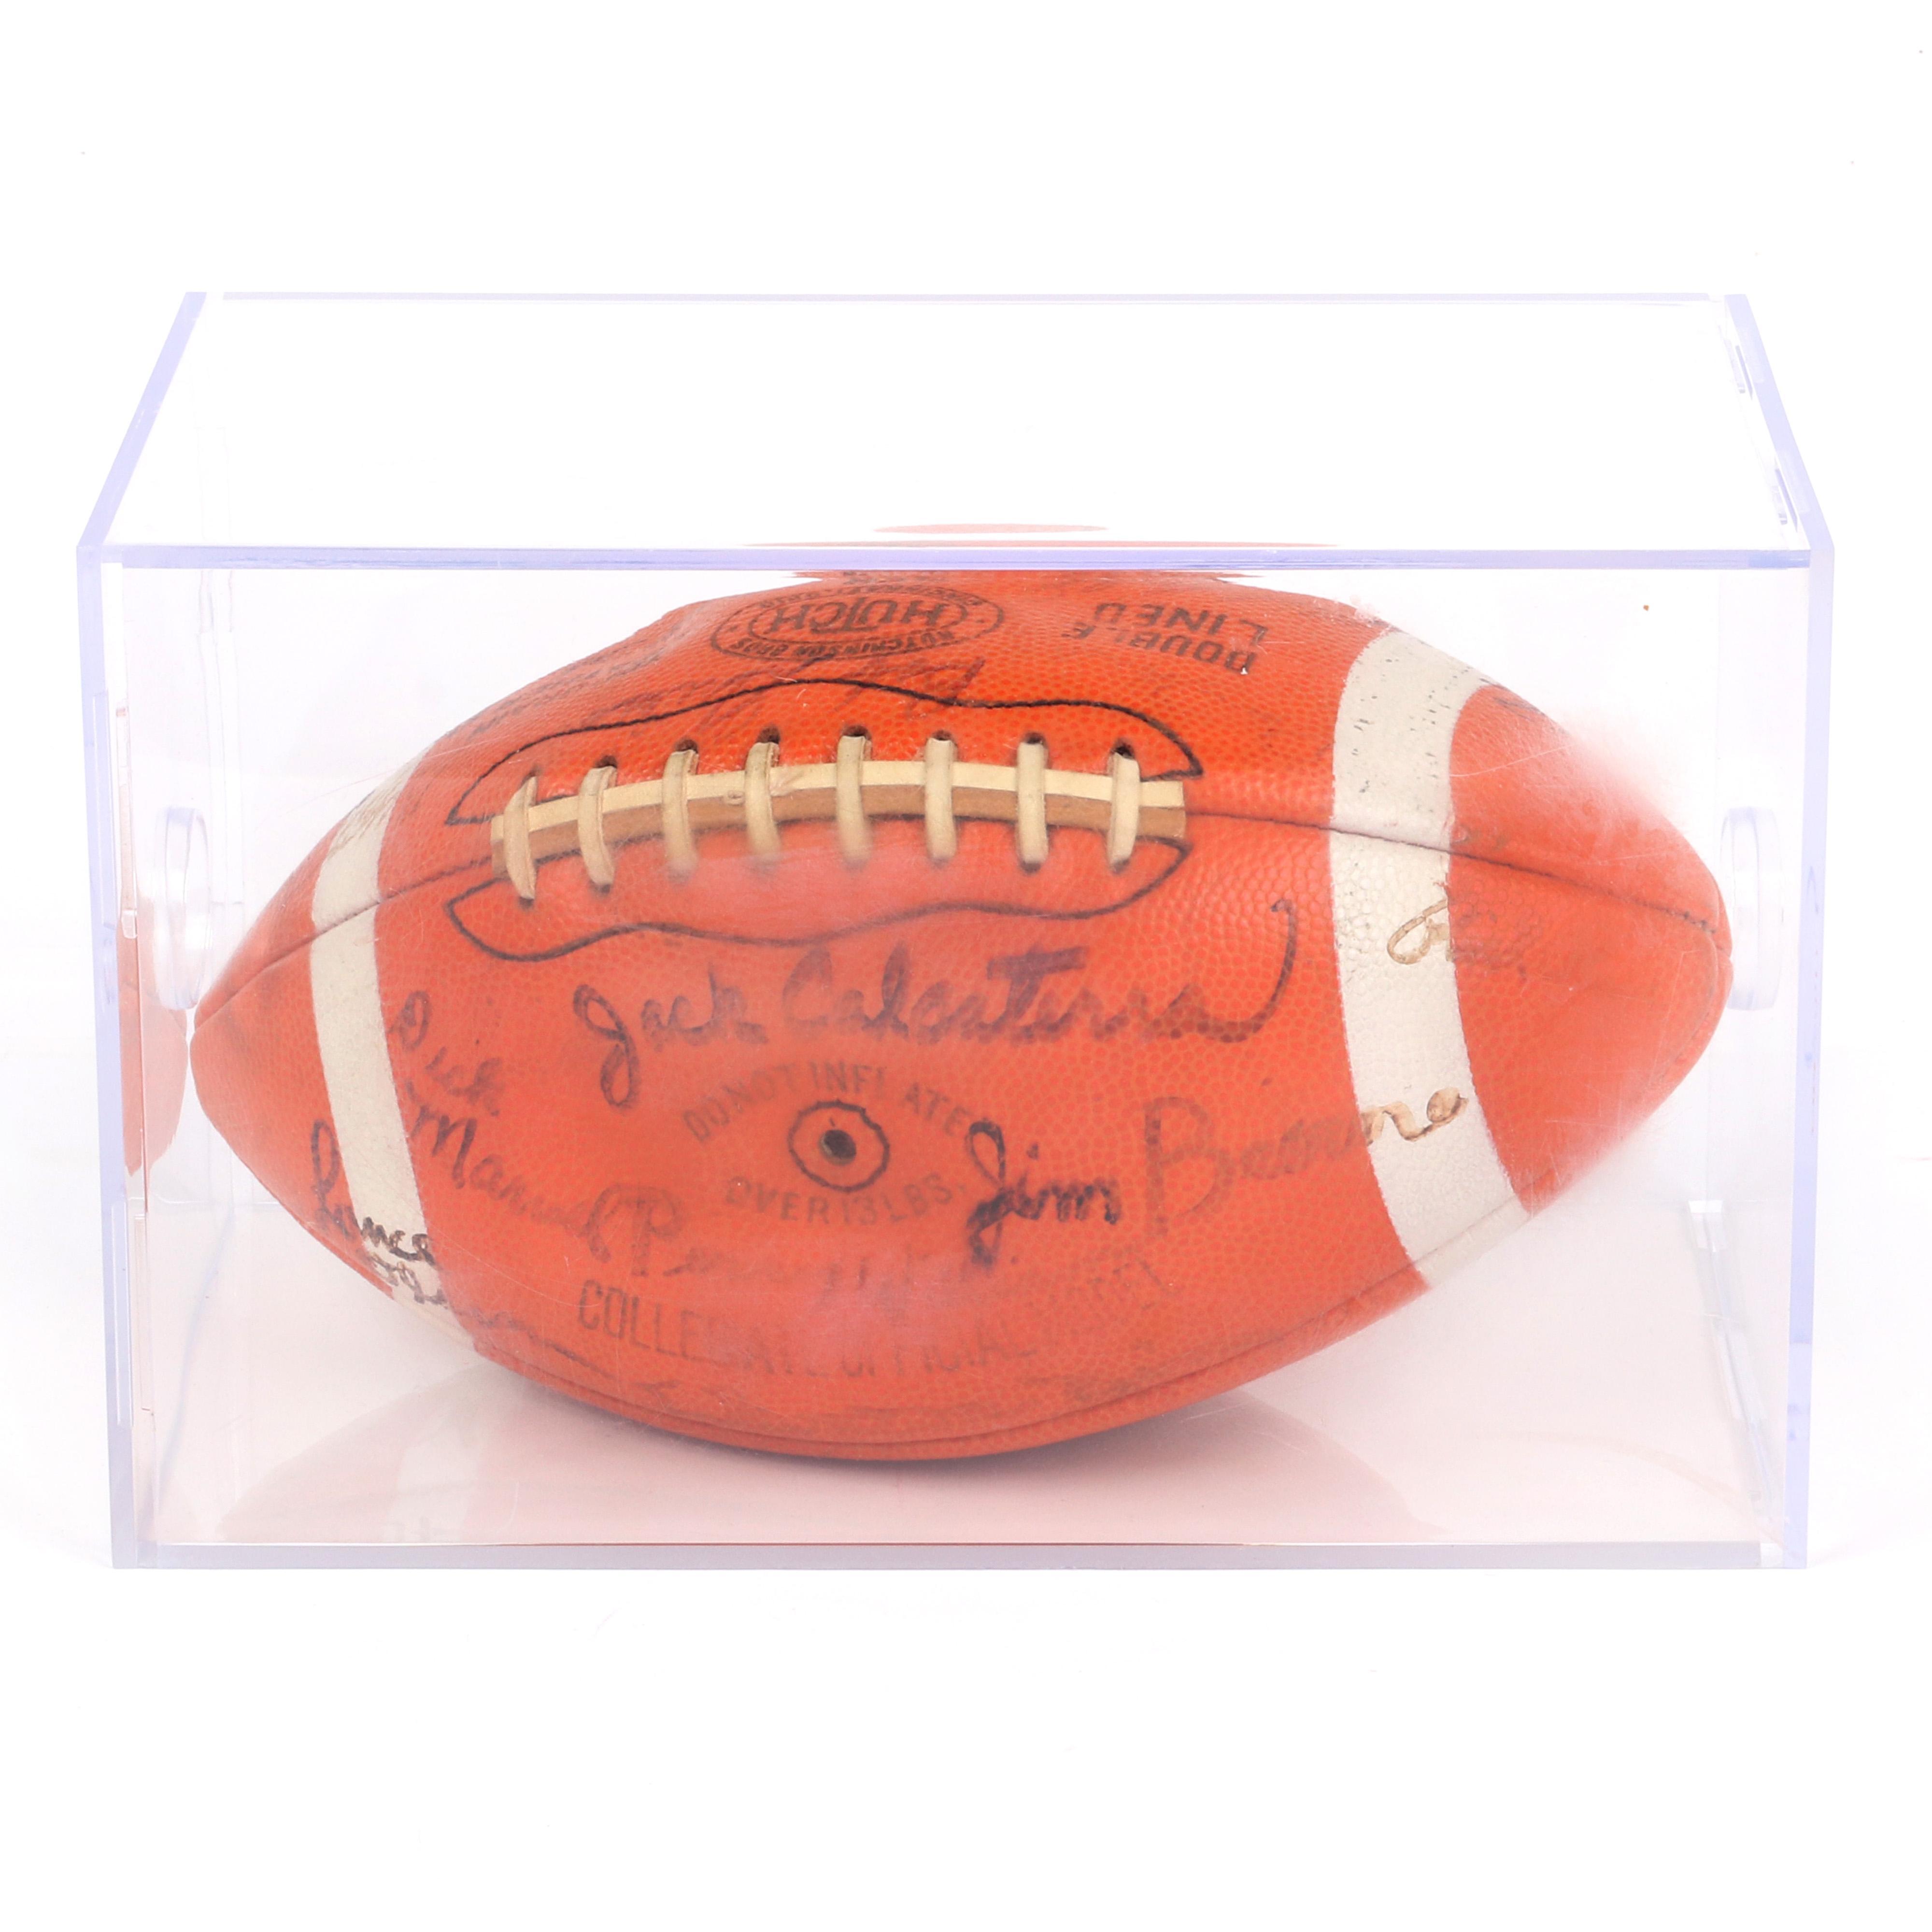 1967 Purdue University Rose Bowl Team Signed Football